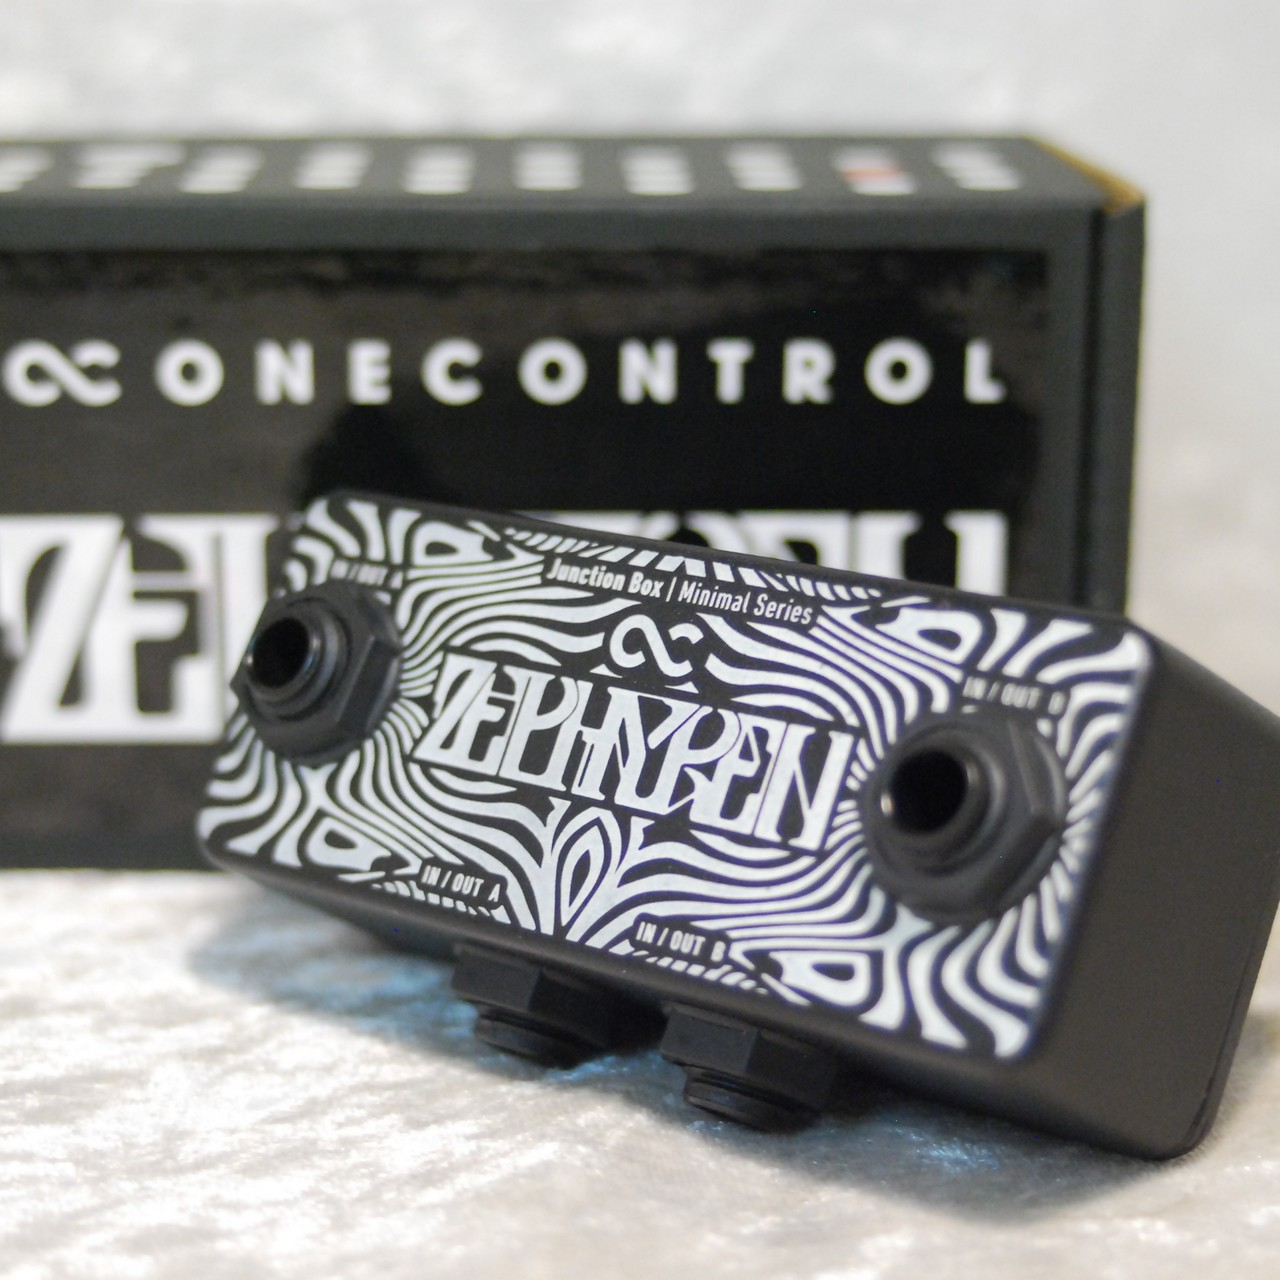 ONE CONTROL Zephyren Junction Box Black 【美品】 ☆9/30 20:29まで!☆